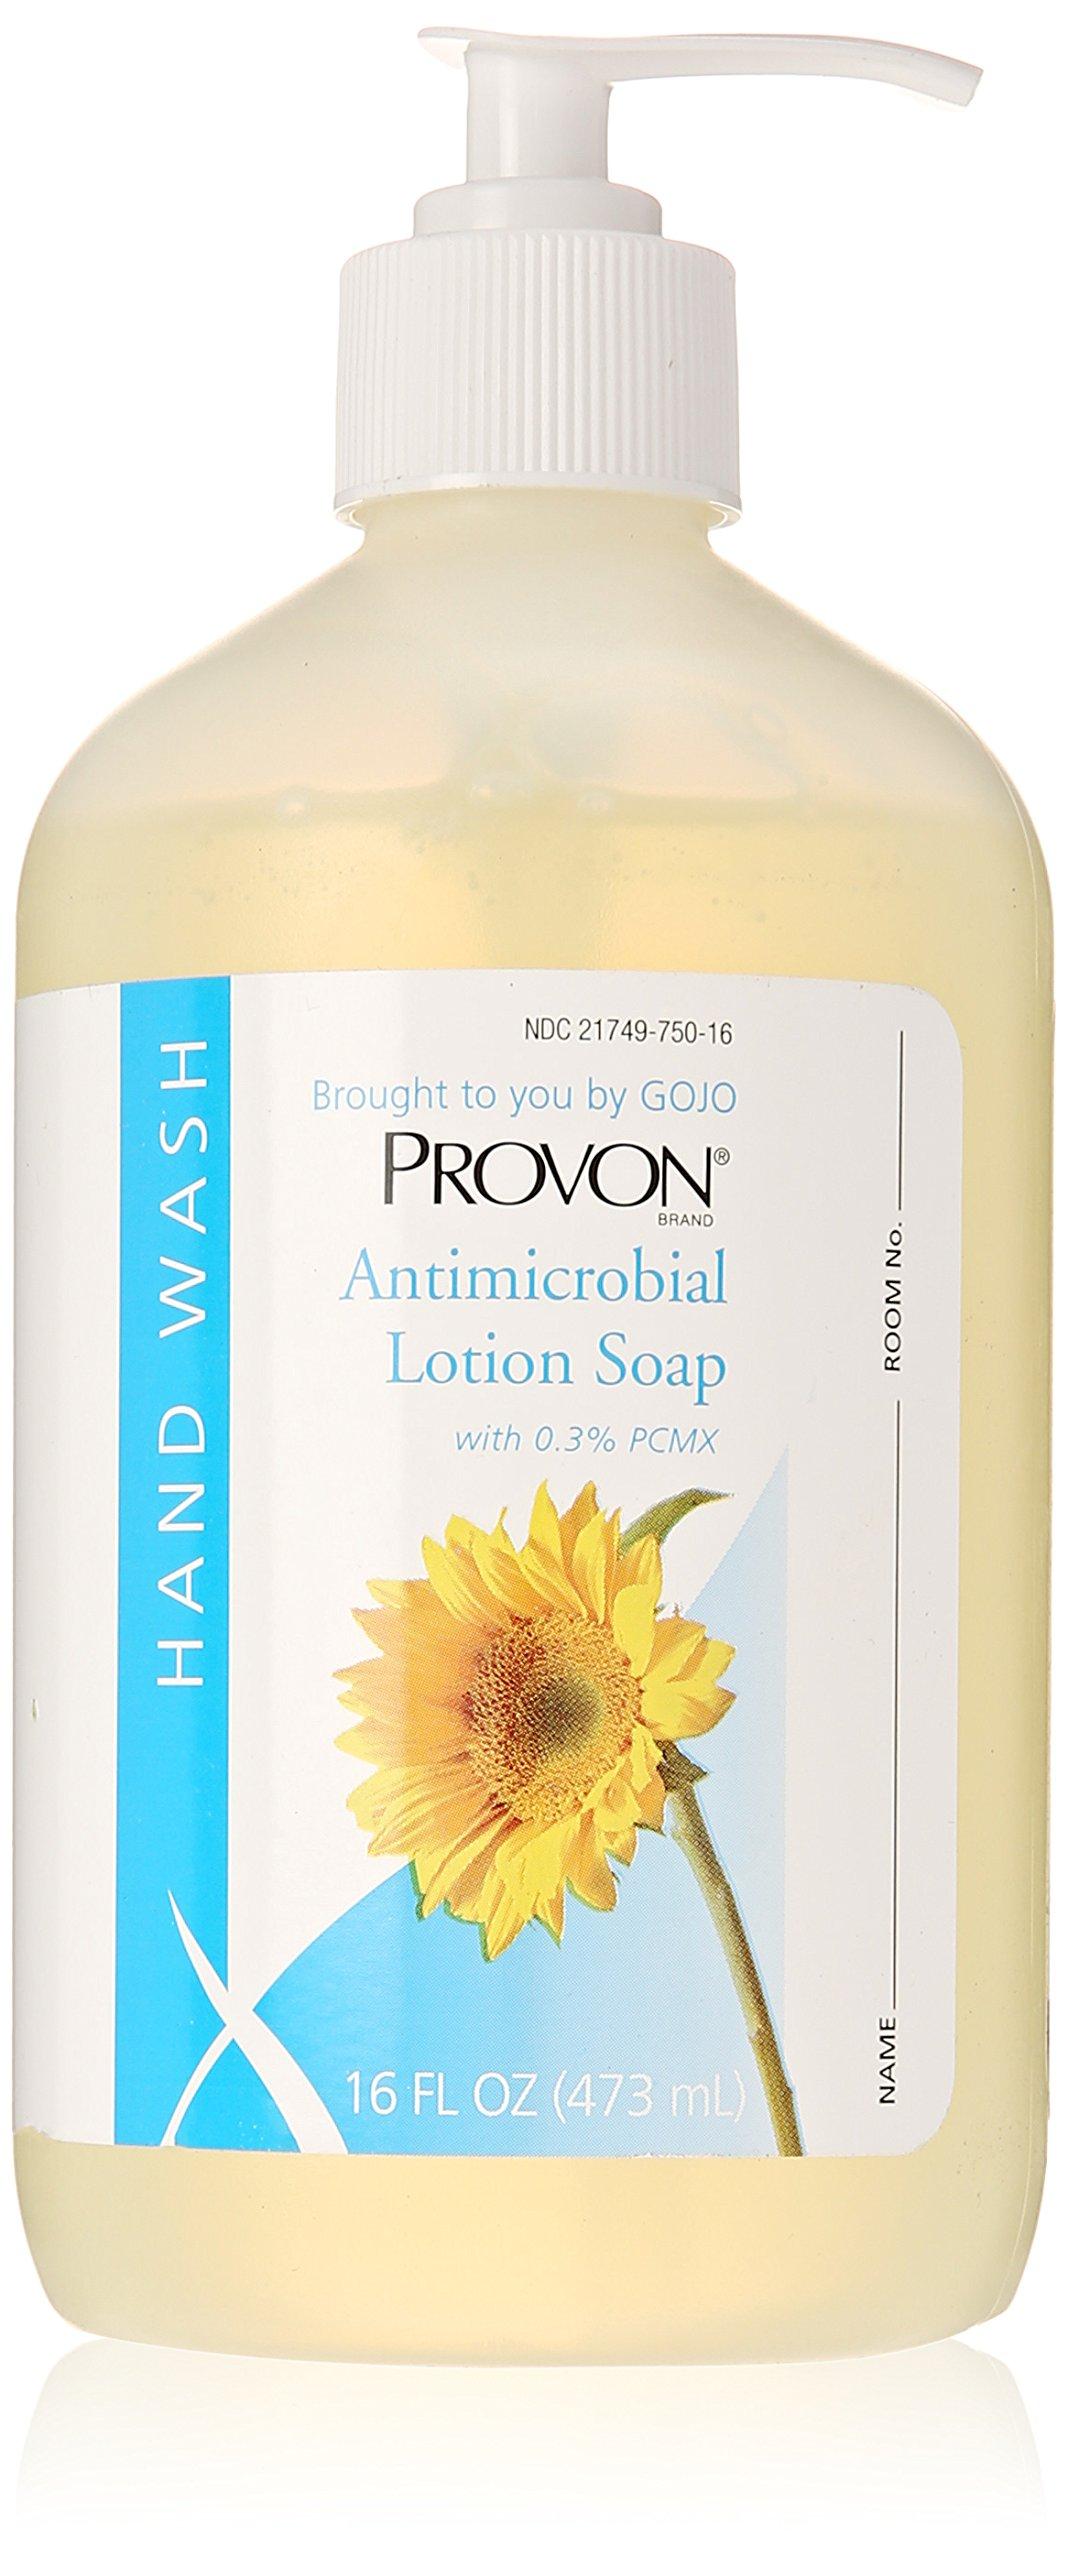 Provon Antimicrobial Lotion Soap - 16 oz Pump by Provon